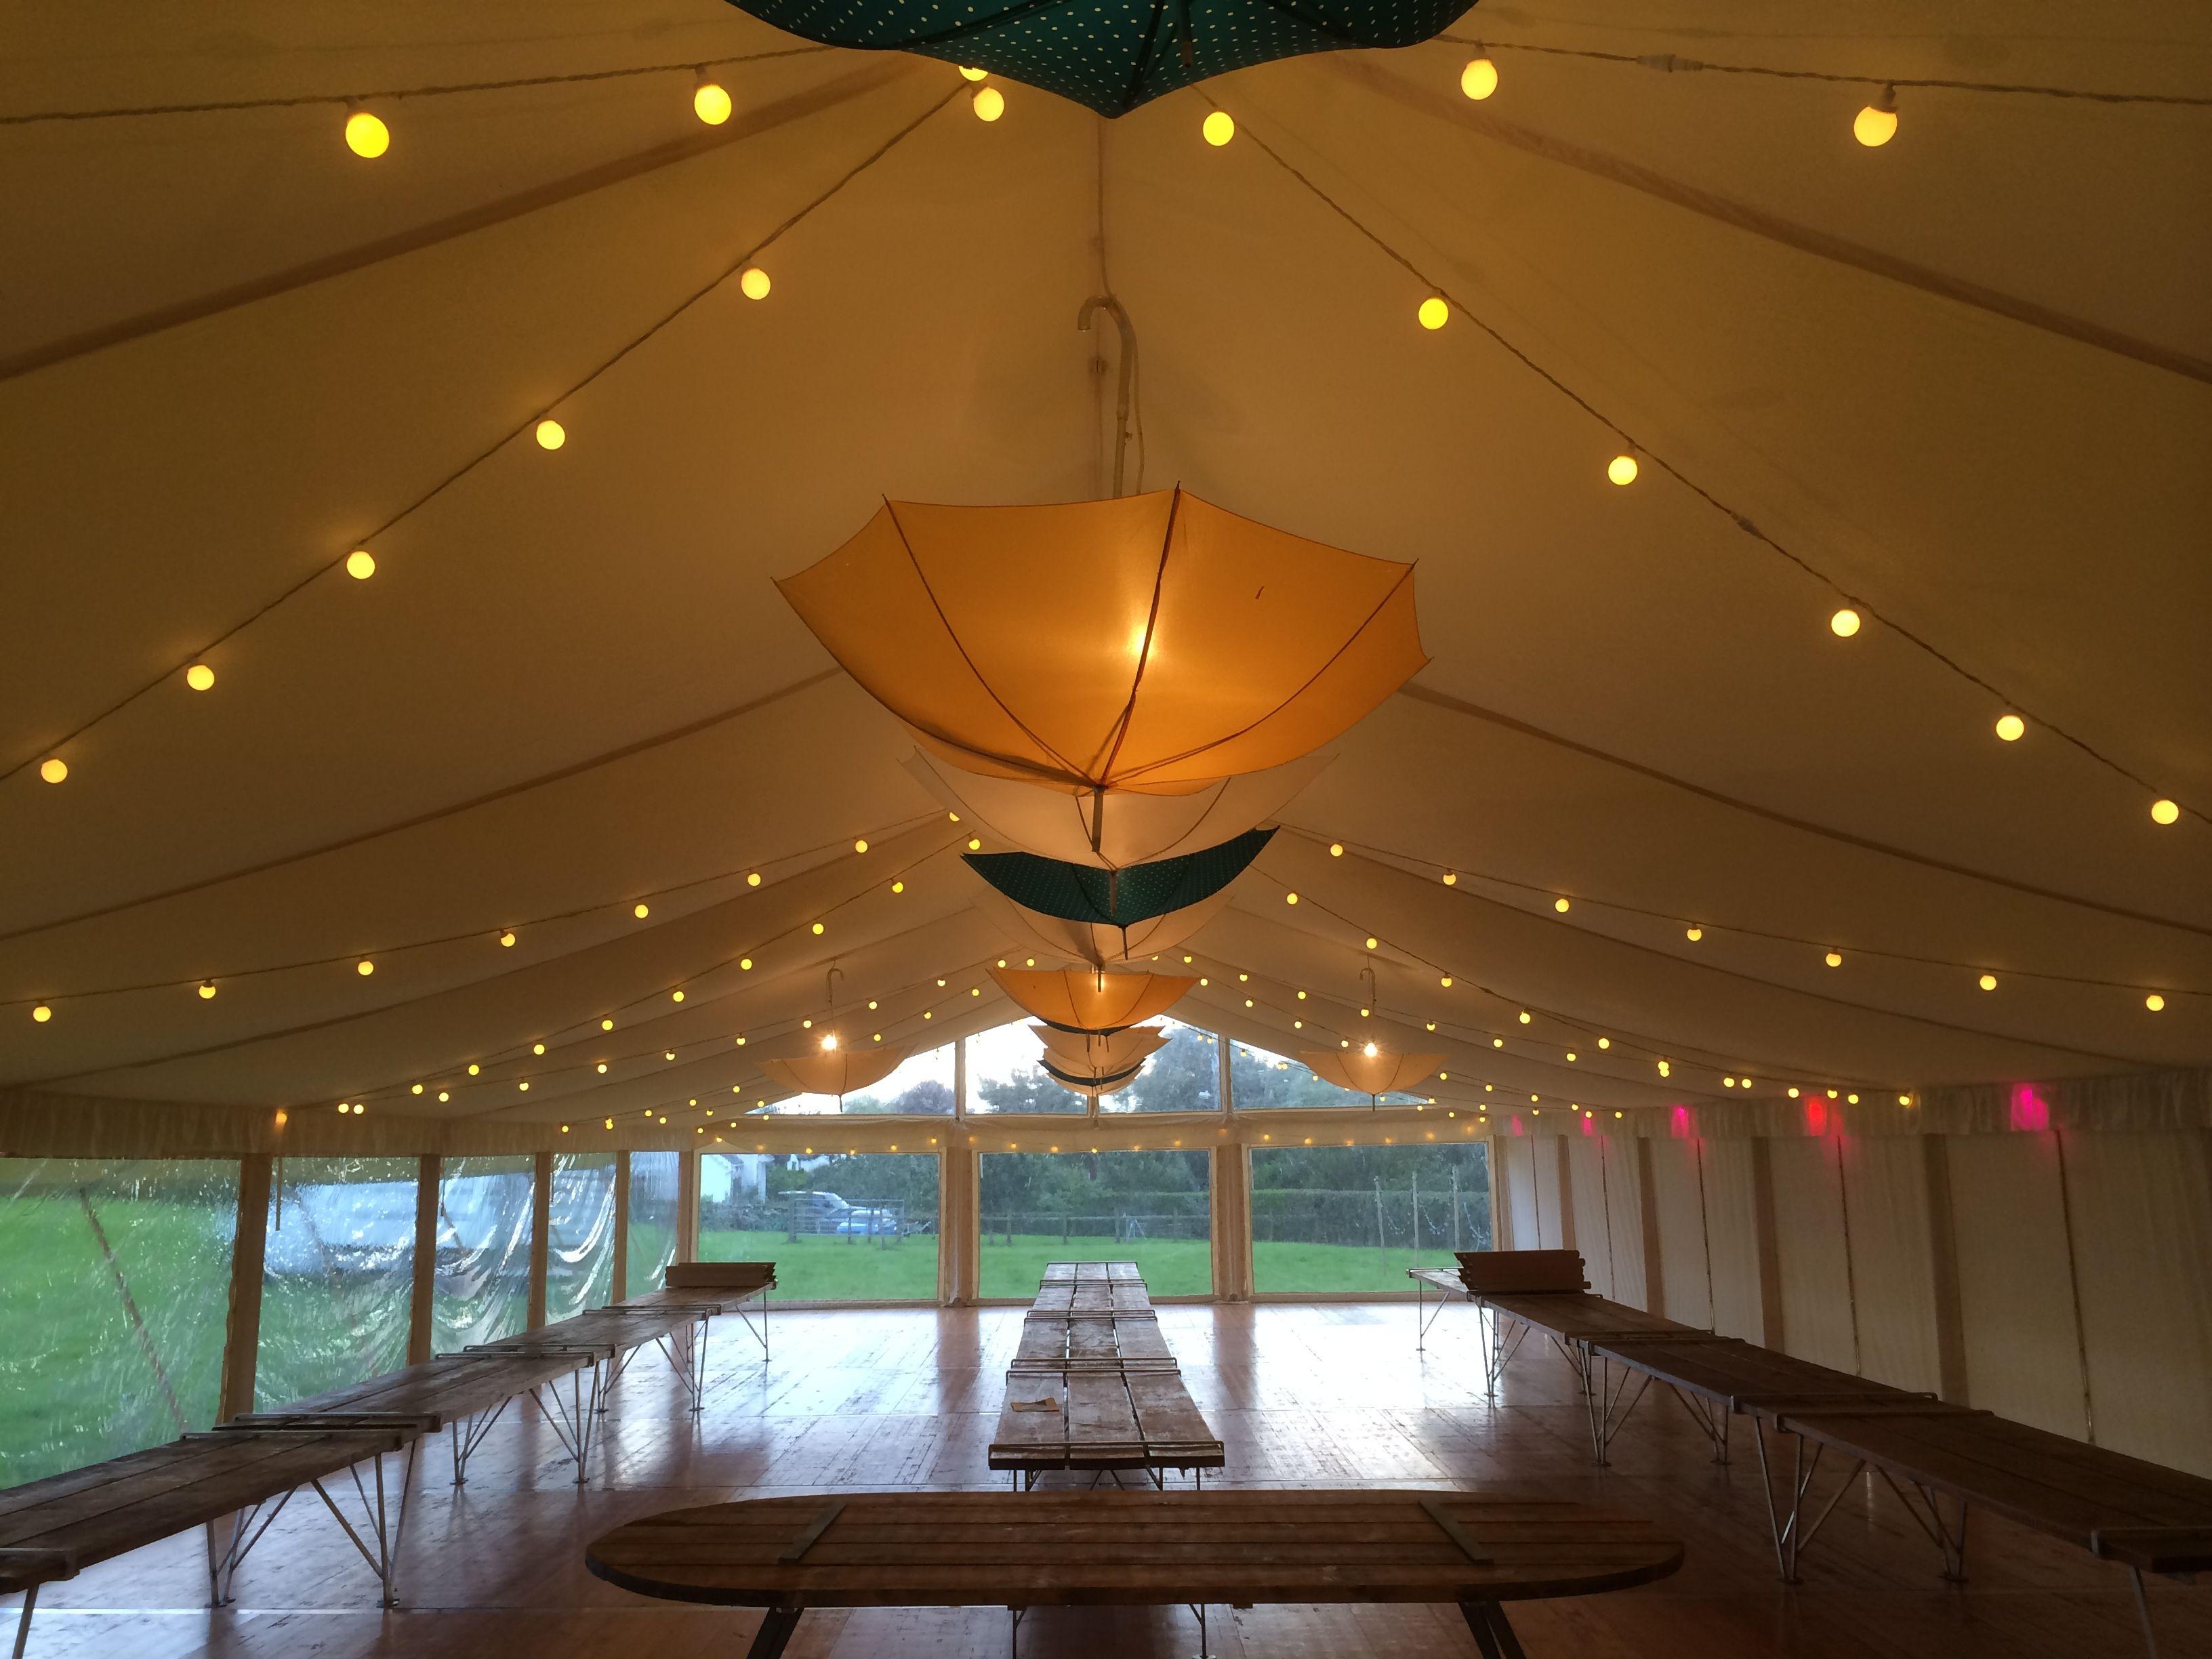 blue umbrella patio power group lighting star with brella amazon dp improvement lights system com pod home